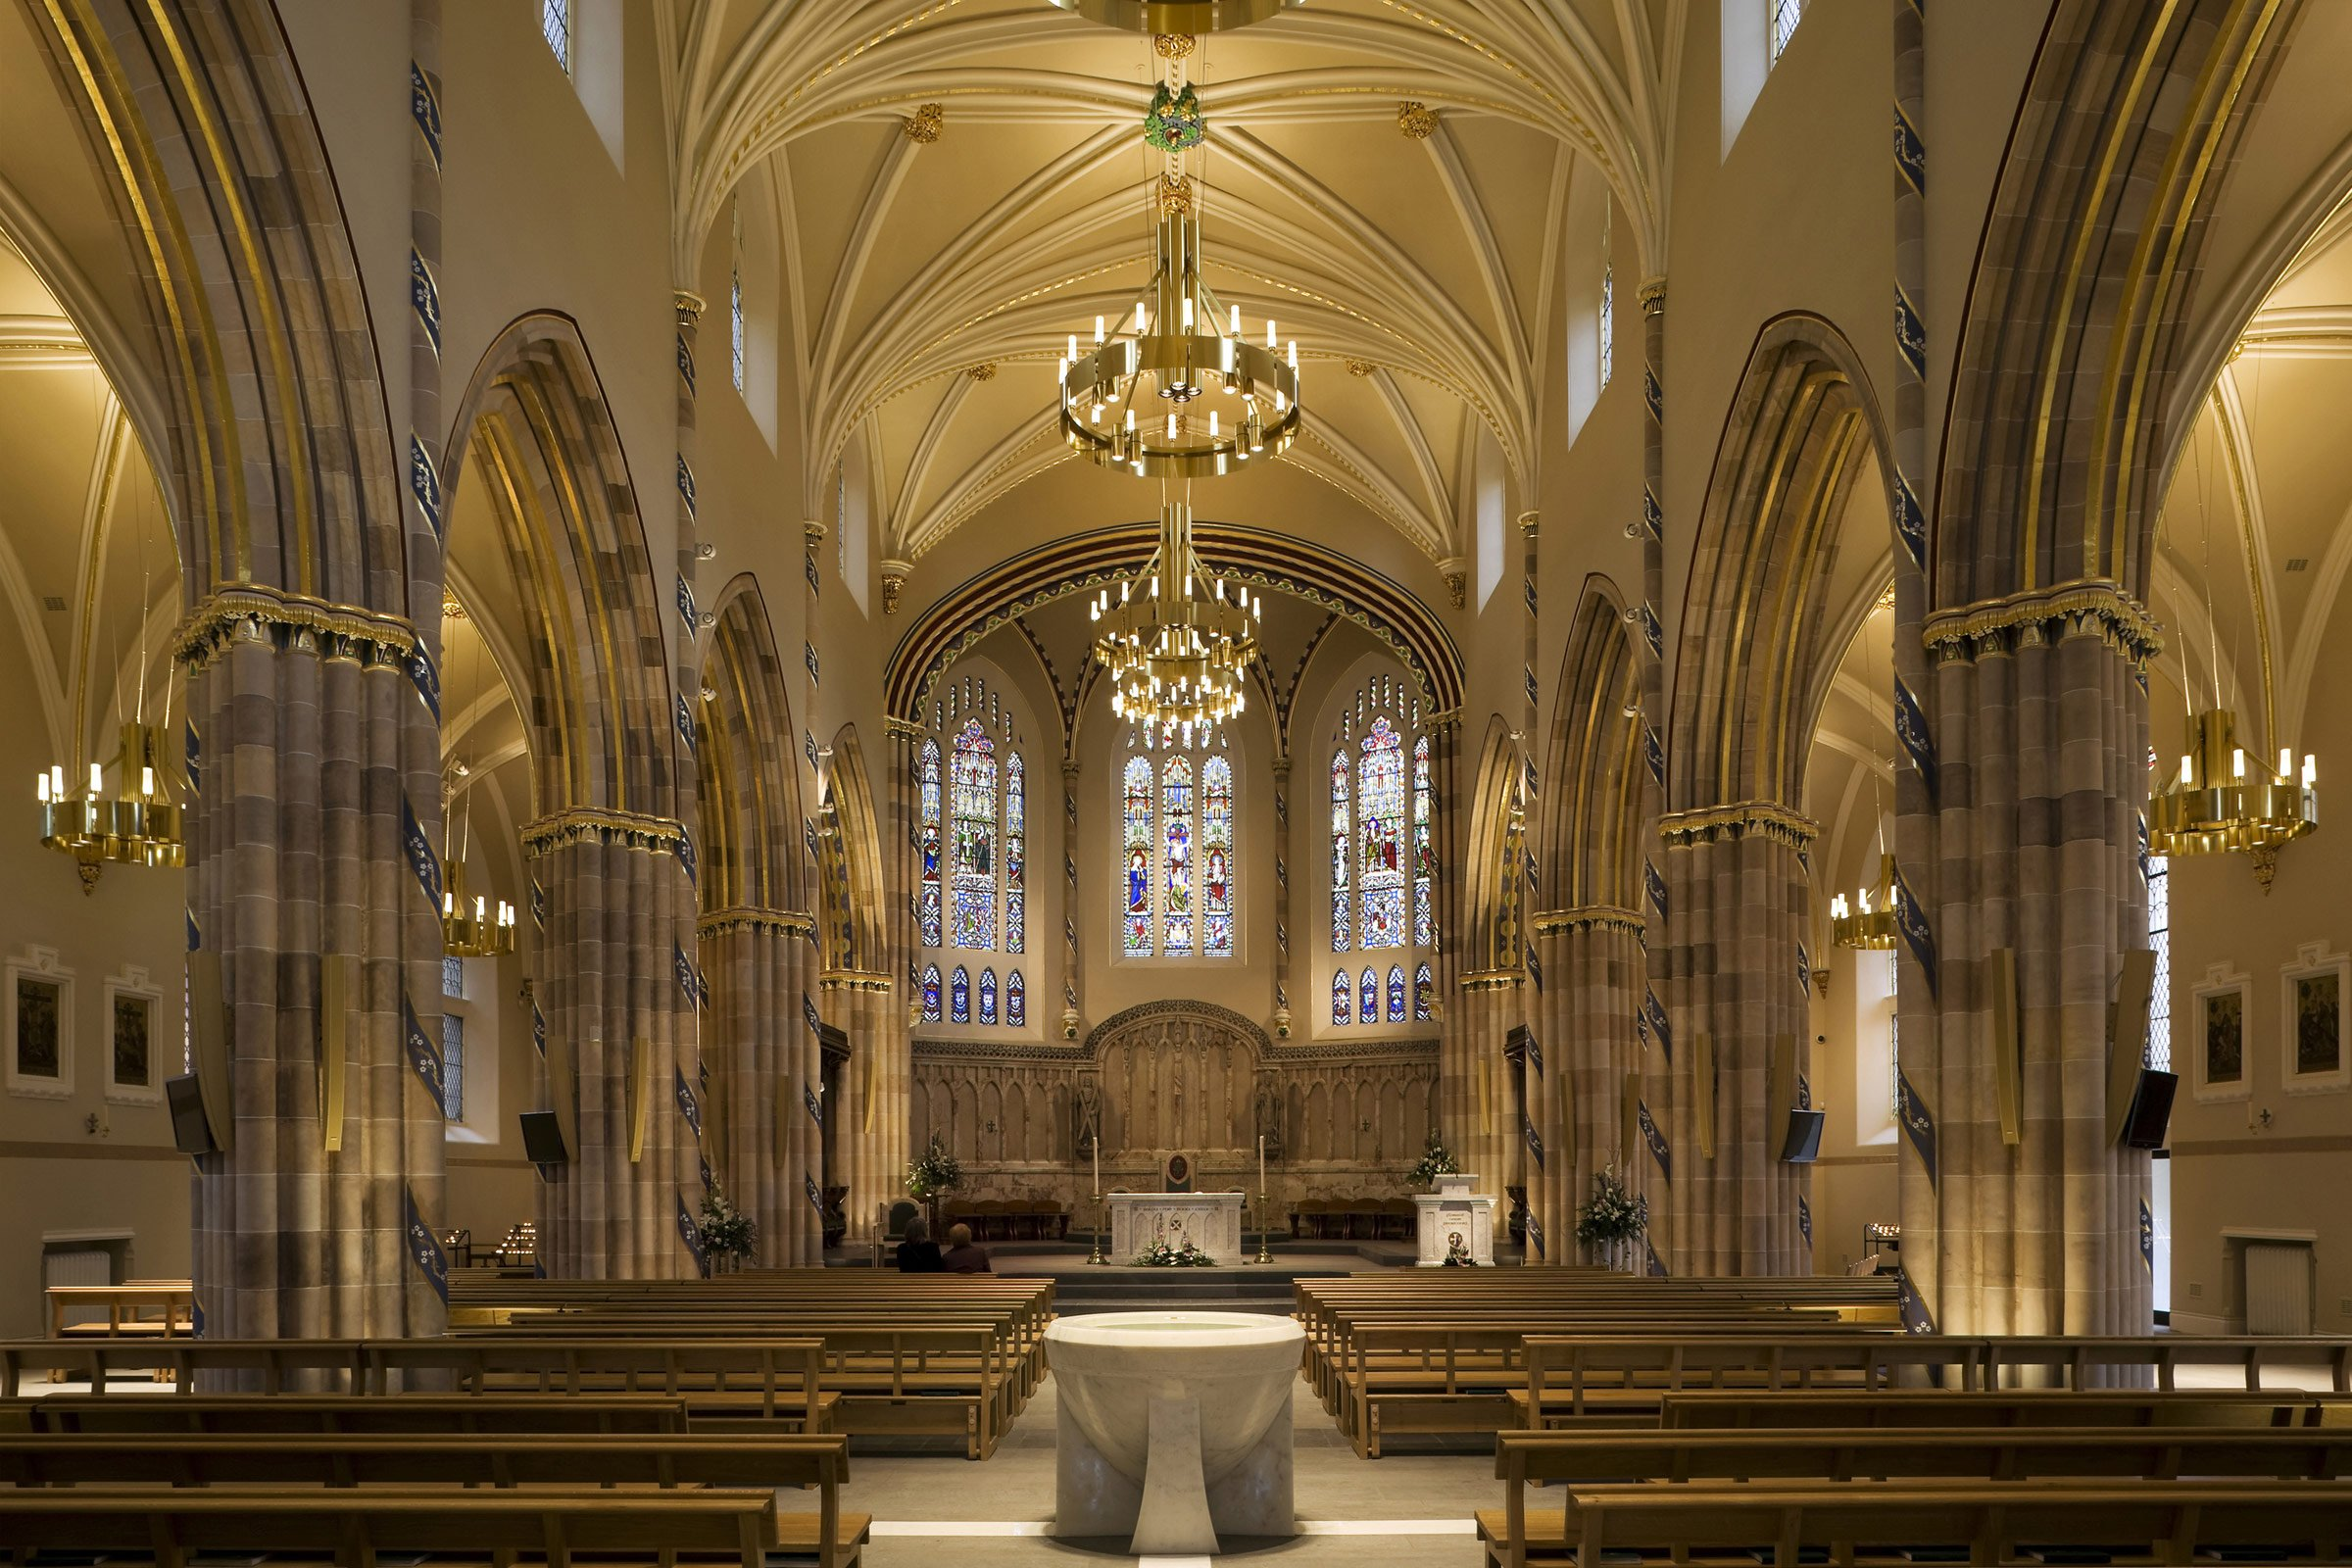 Mass (In English)